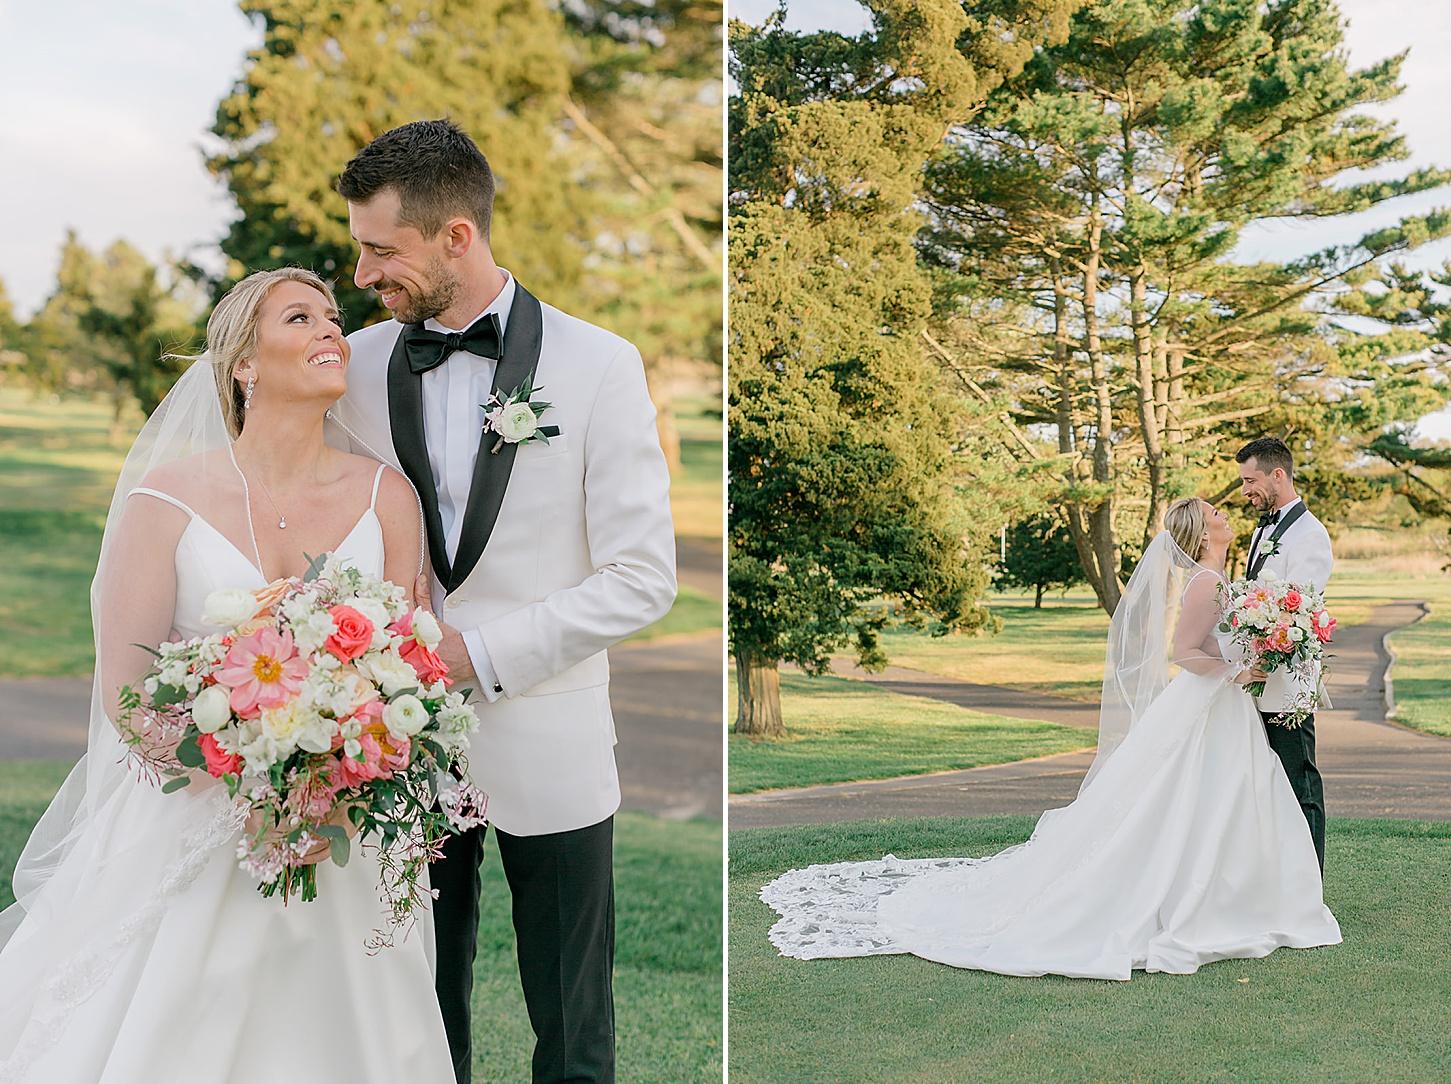 Linwood Country Club Summer Wedding Photography Studio by Magdalena Studios Jenn Kyle 0036